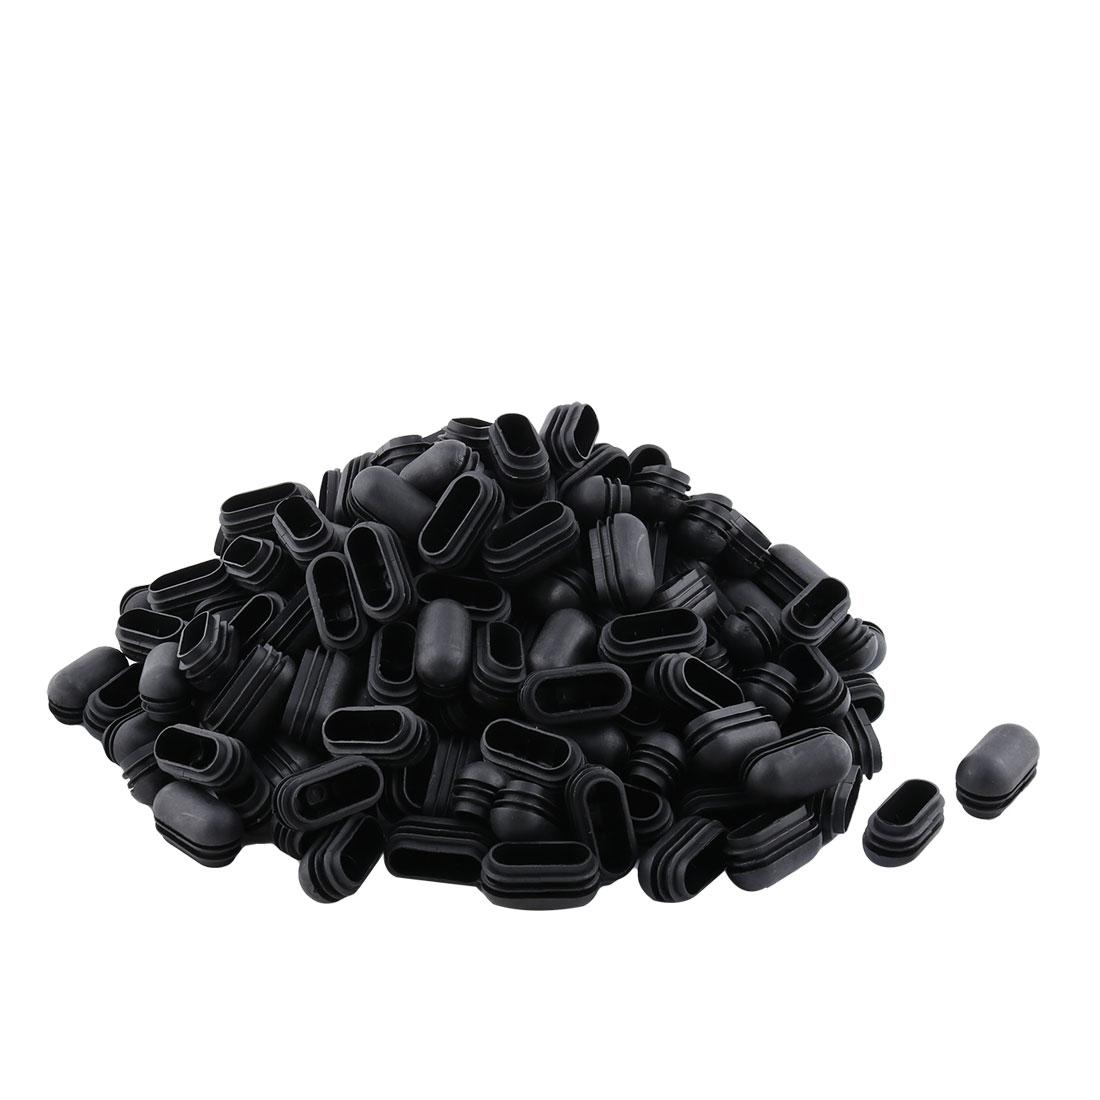 Furniture Plastic Oval Bench Feet Blanking Cap Tube Insert Black 24mm x 49mm 200pcs